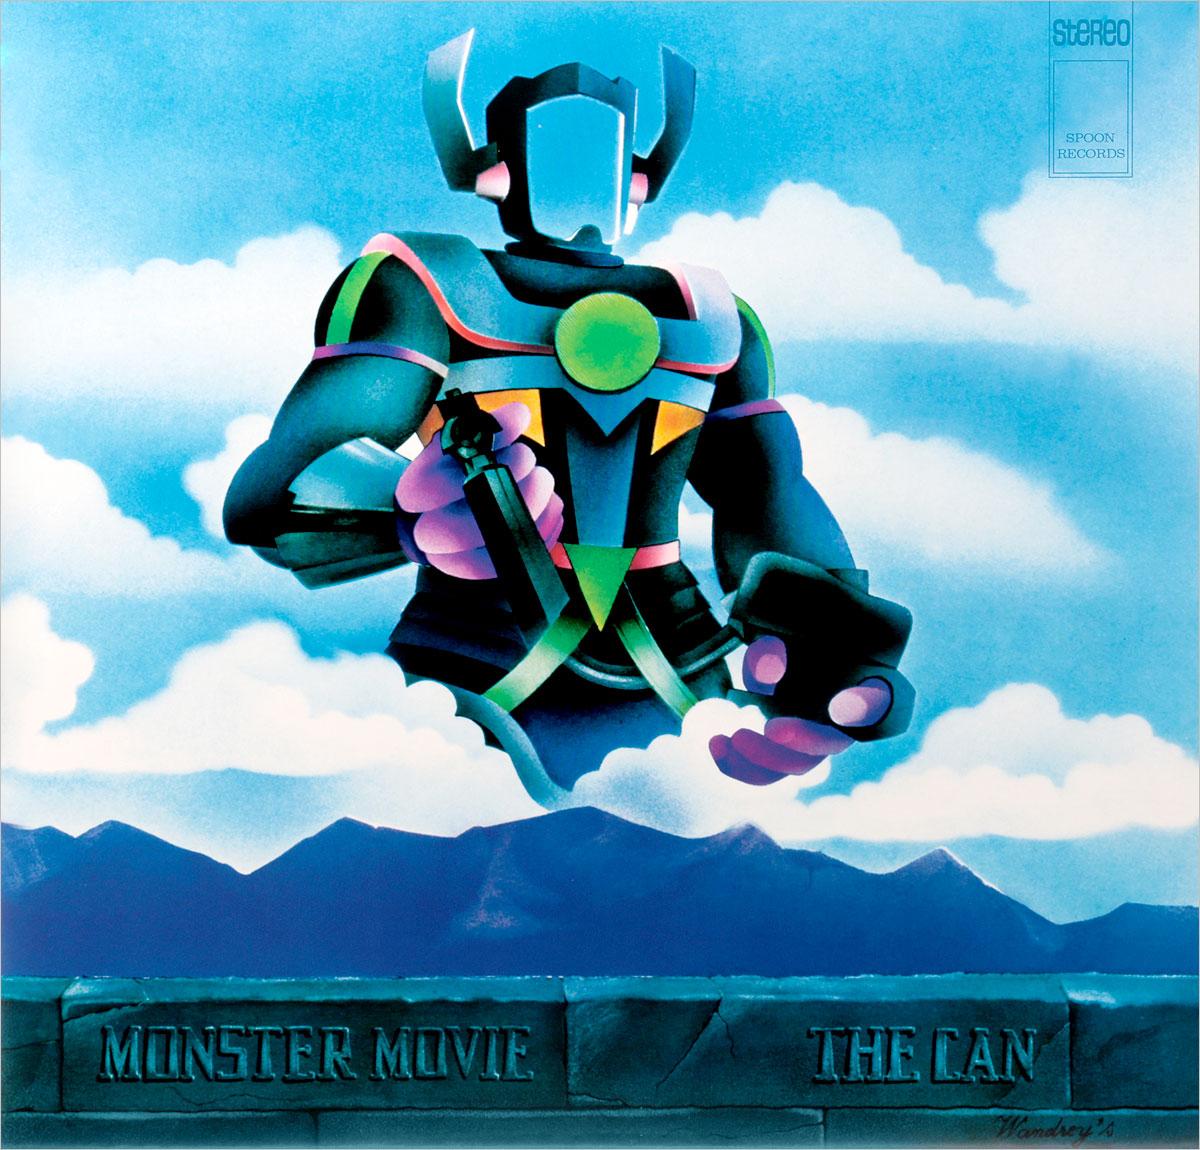 Can Can. Monster Movie (LP) can can monster movie lp